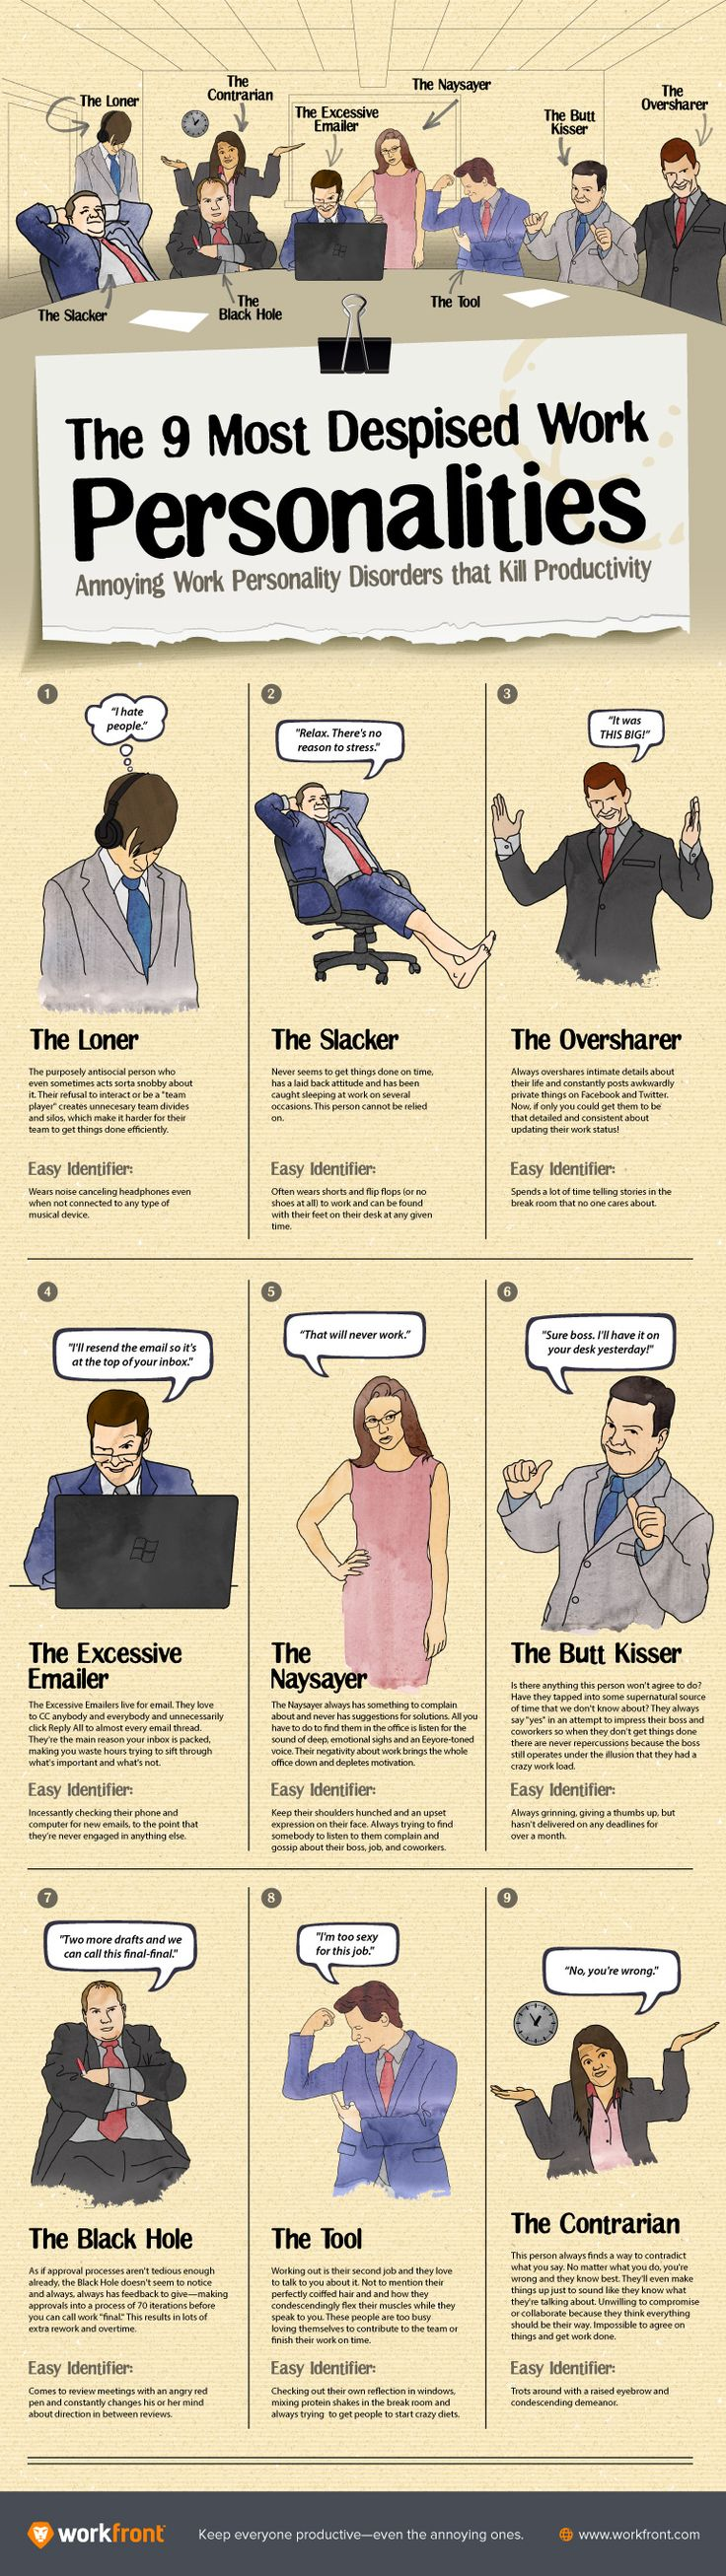 Best 25 human resources ideas on pinterest human resources the 9 most despised work personalities workfront resources xflitez Gallery